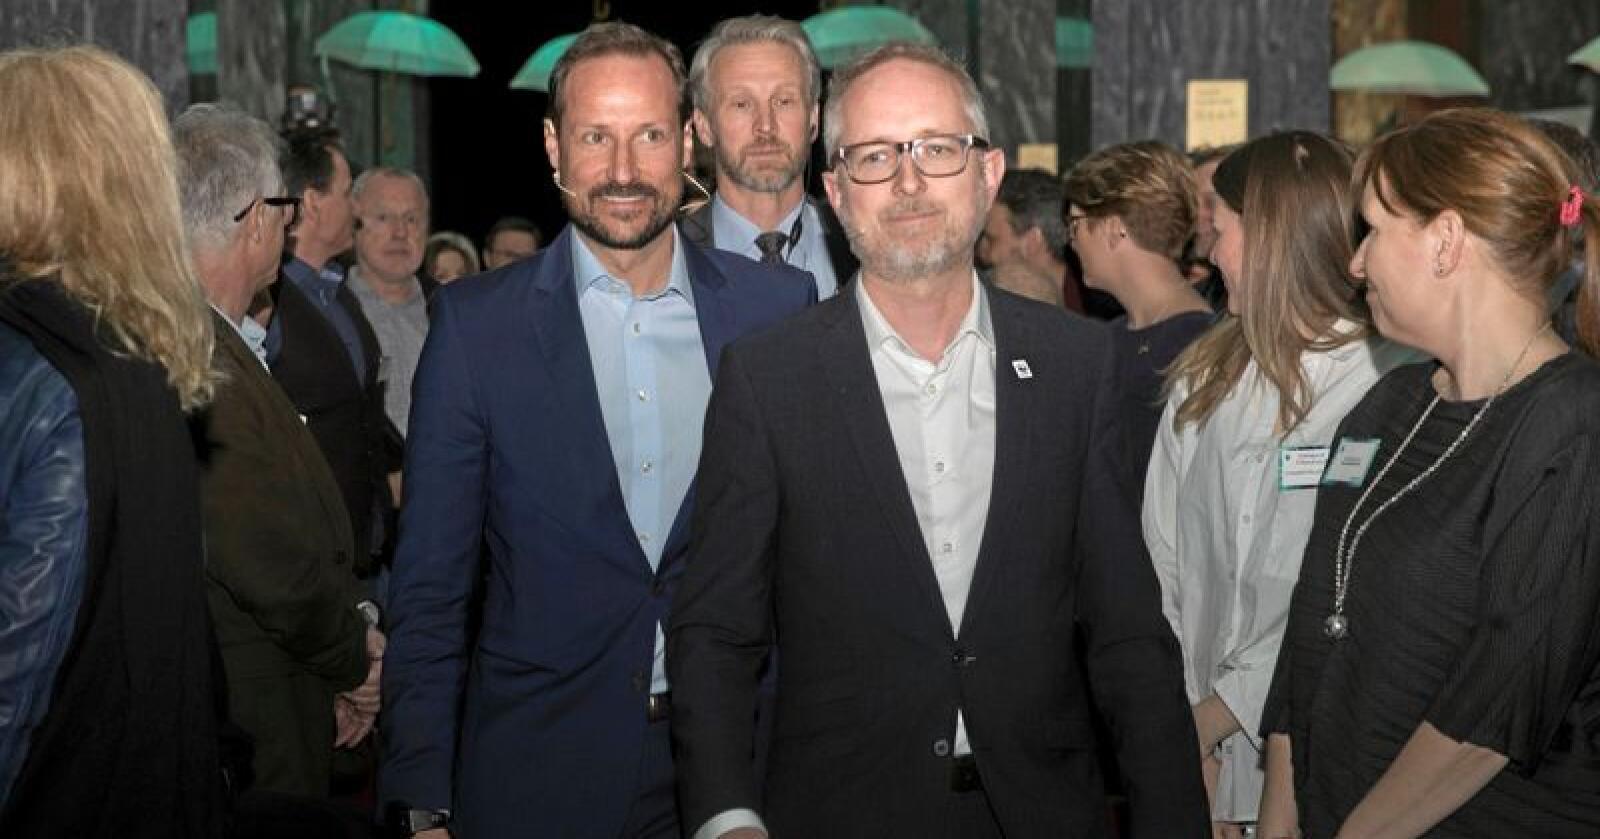 Kronprins Haakon og generalsekretær Bård Vegar Solhjell i WWF Verdens naturfond ankommer arrangementet Miljøtalen. Foto: Terje Bendiksby / NTB scanpix